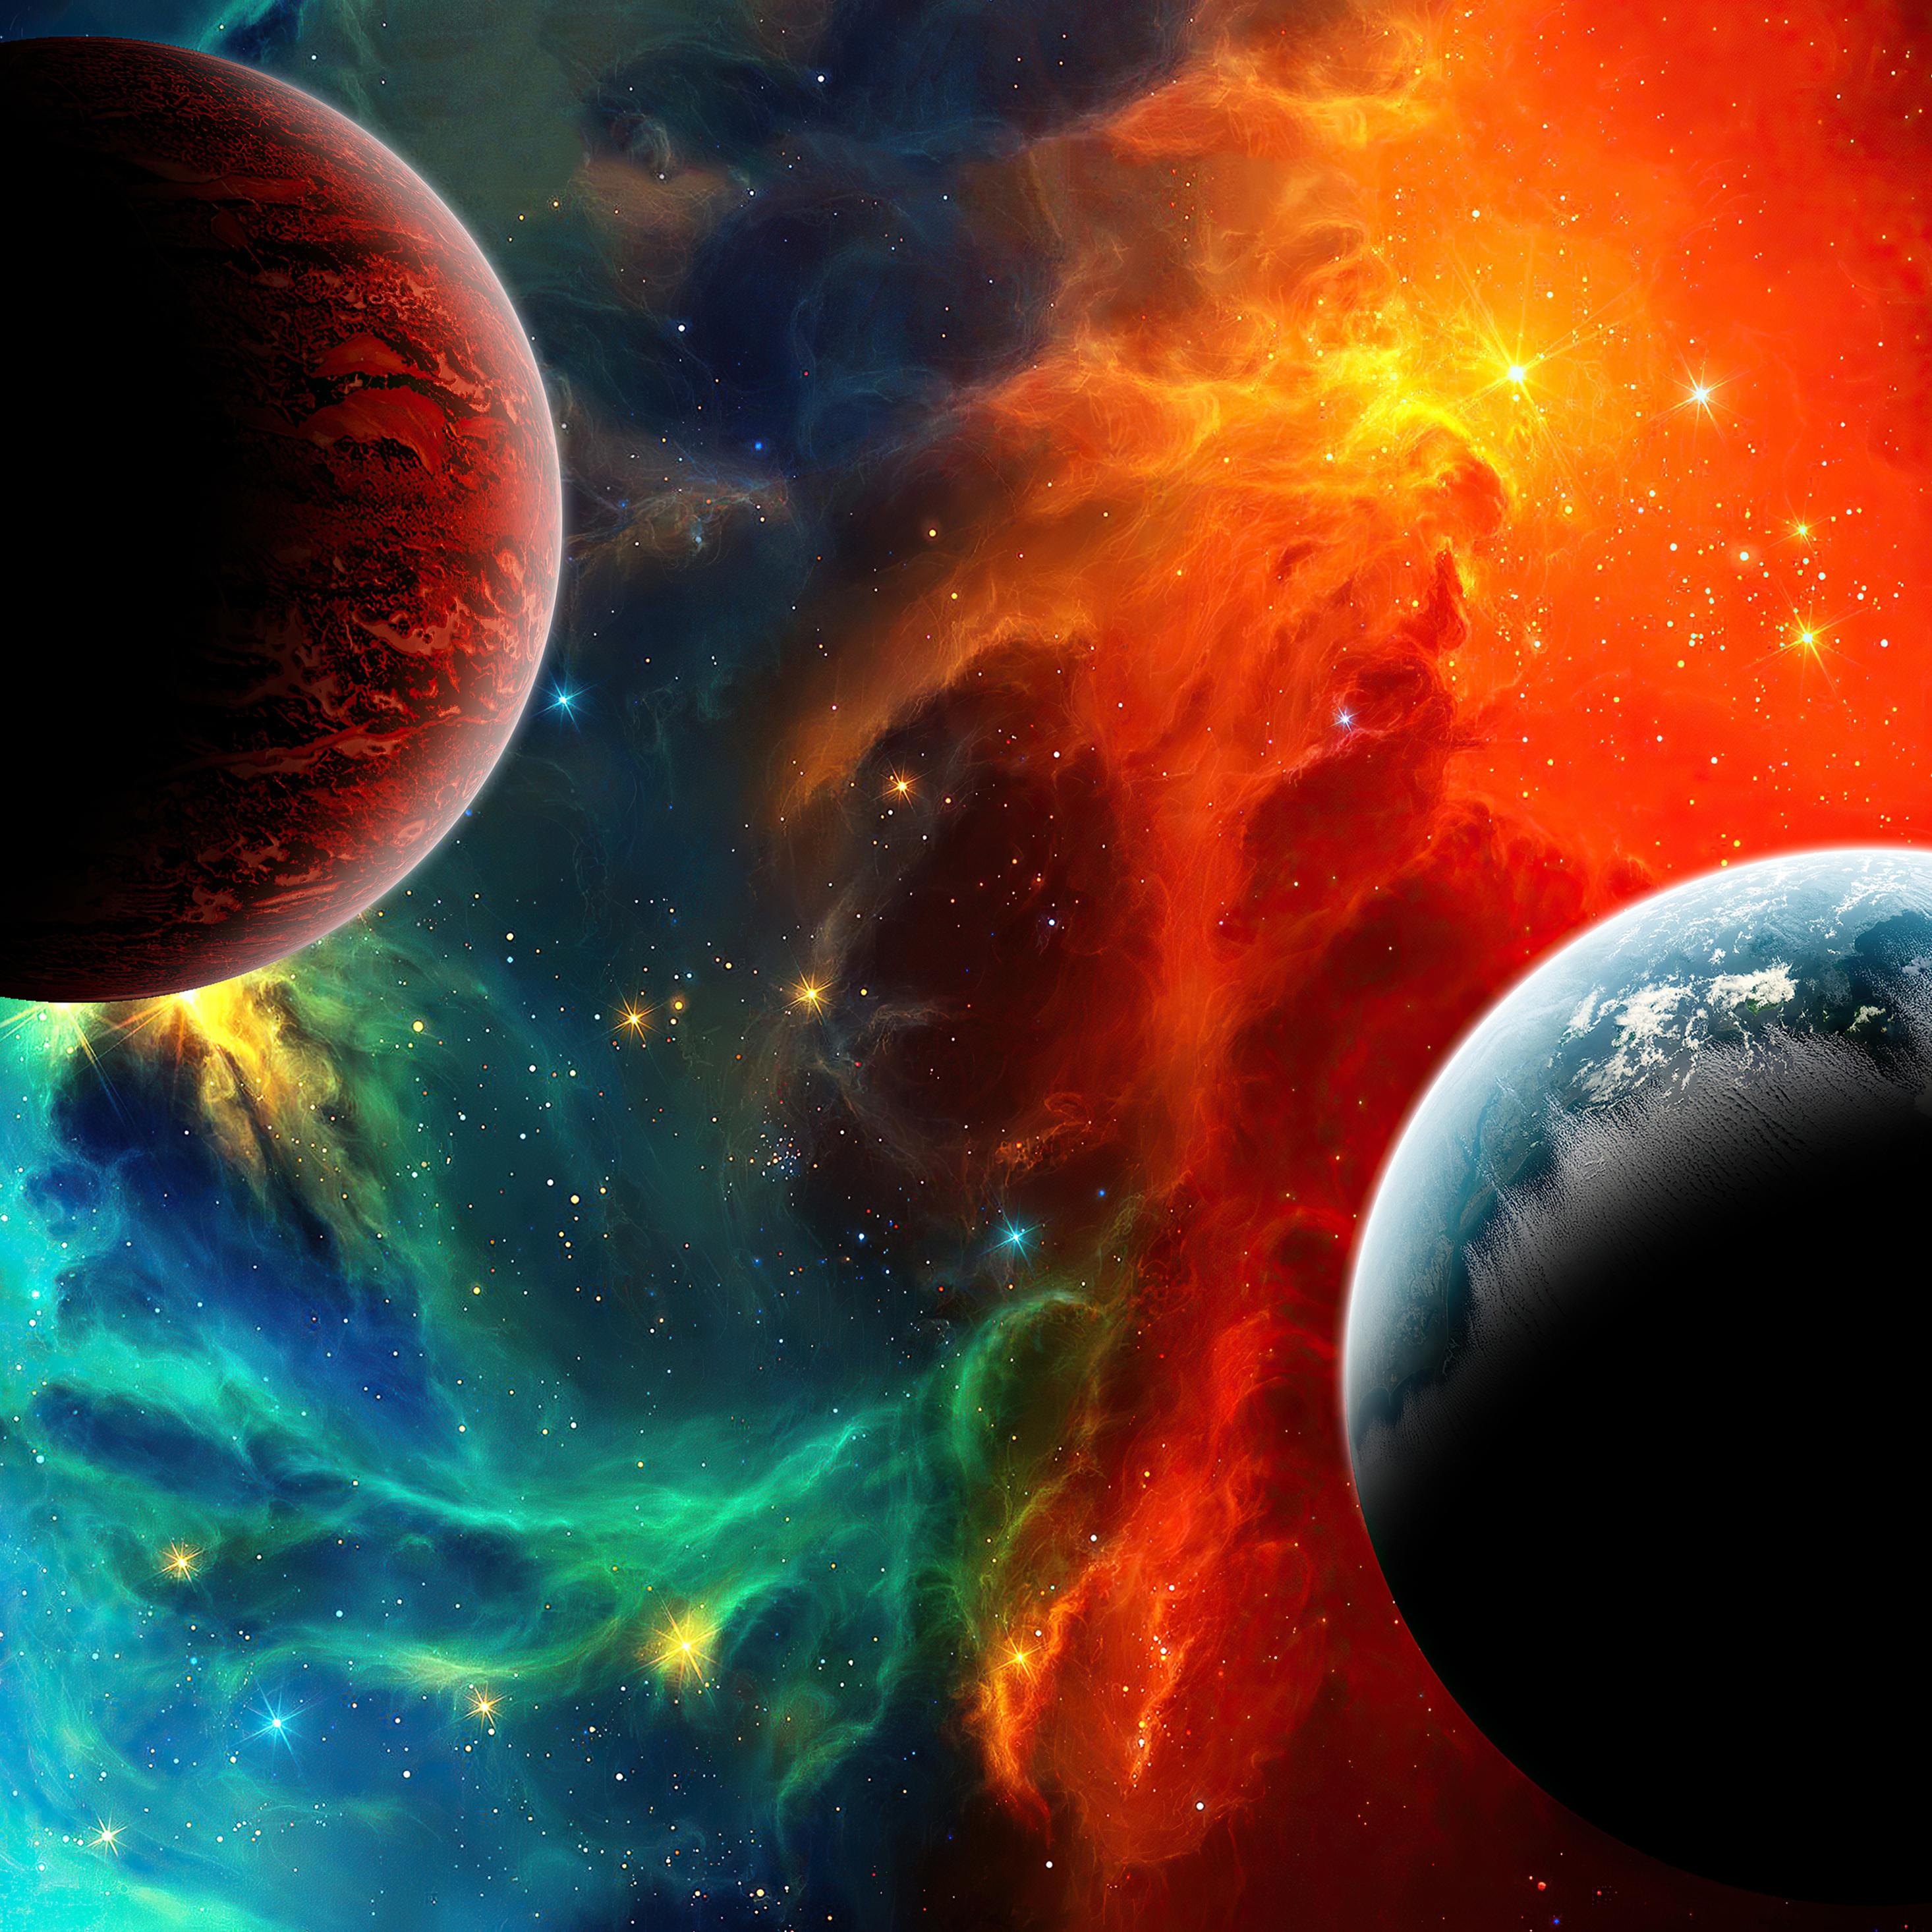 2932x2932 Colorful Nebula Space 4k Ipad Pro Retina Display ...